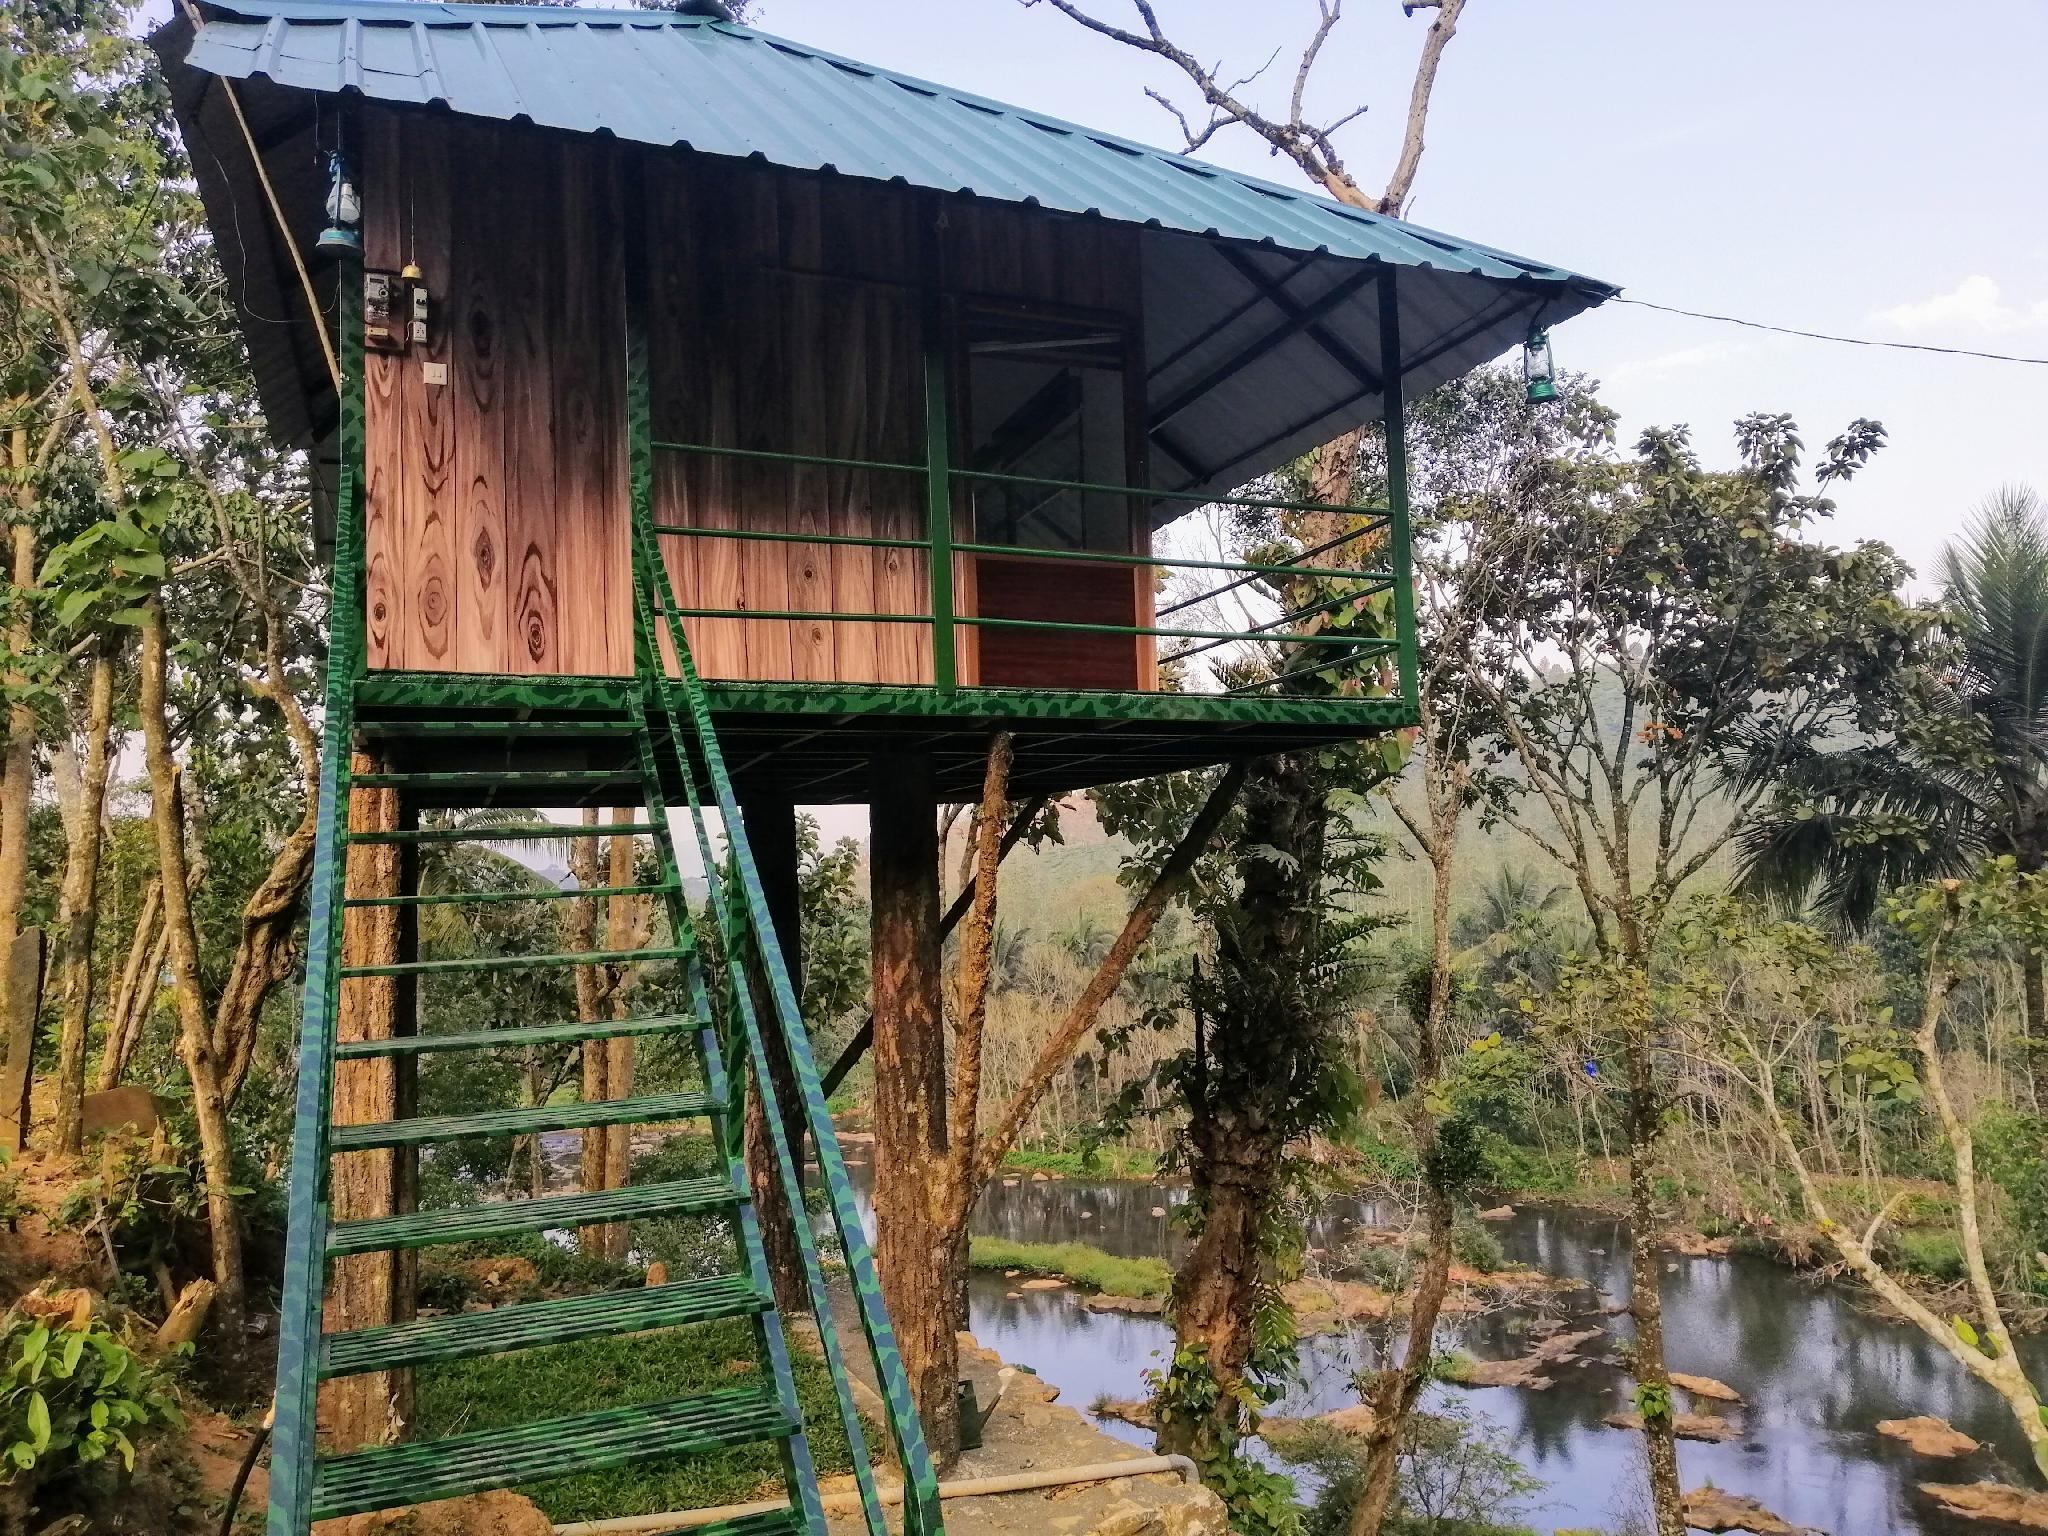 Noahs Nest Tree House